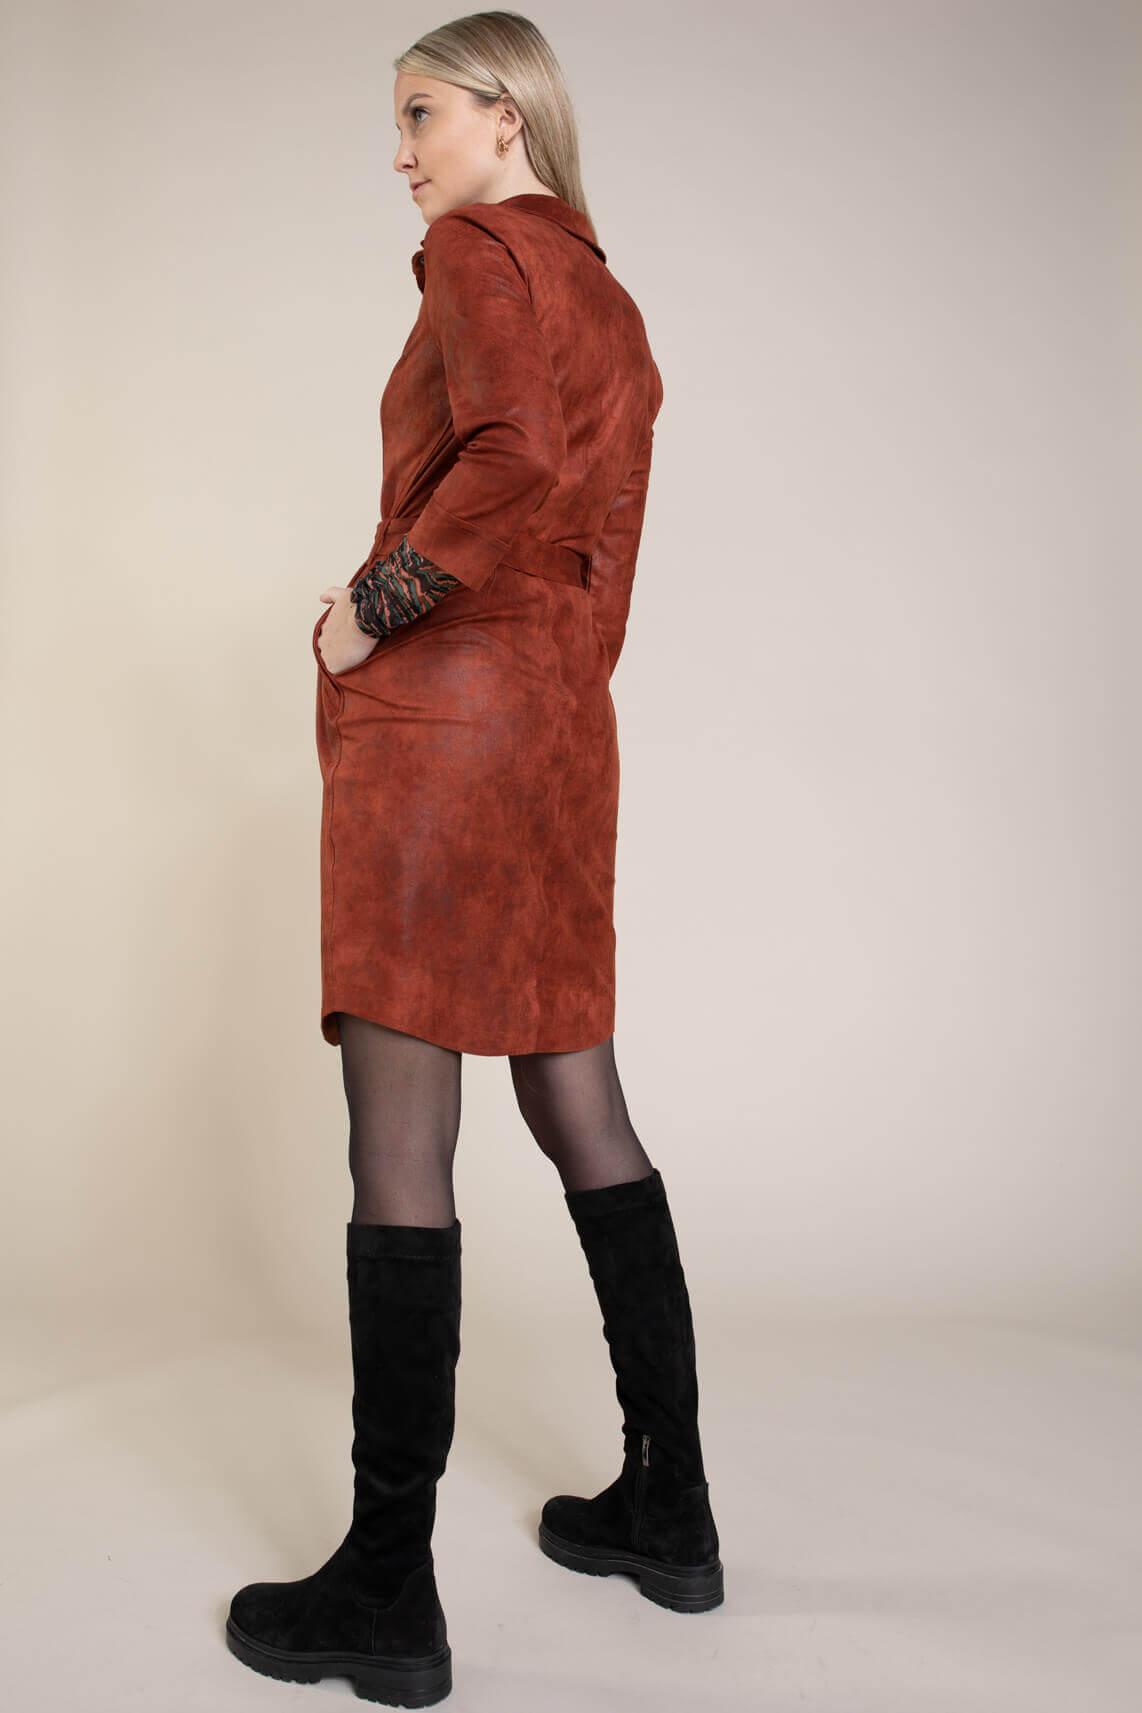 Anna Dames Imitatie leren jurk Rood